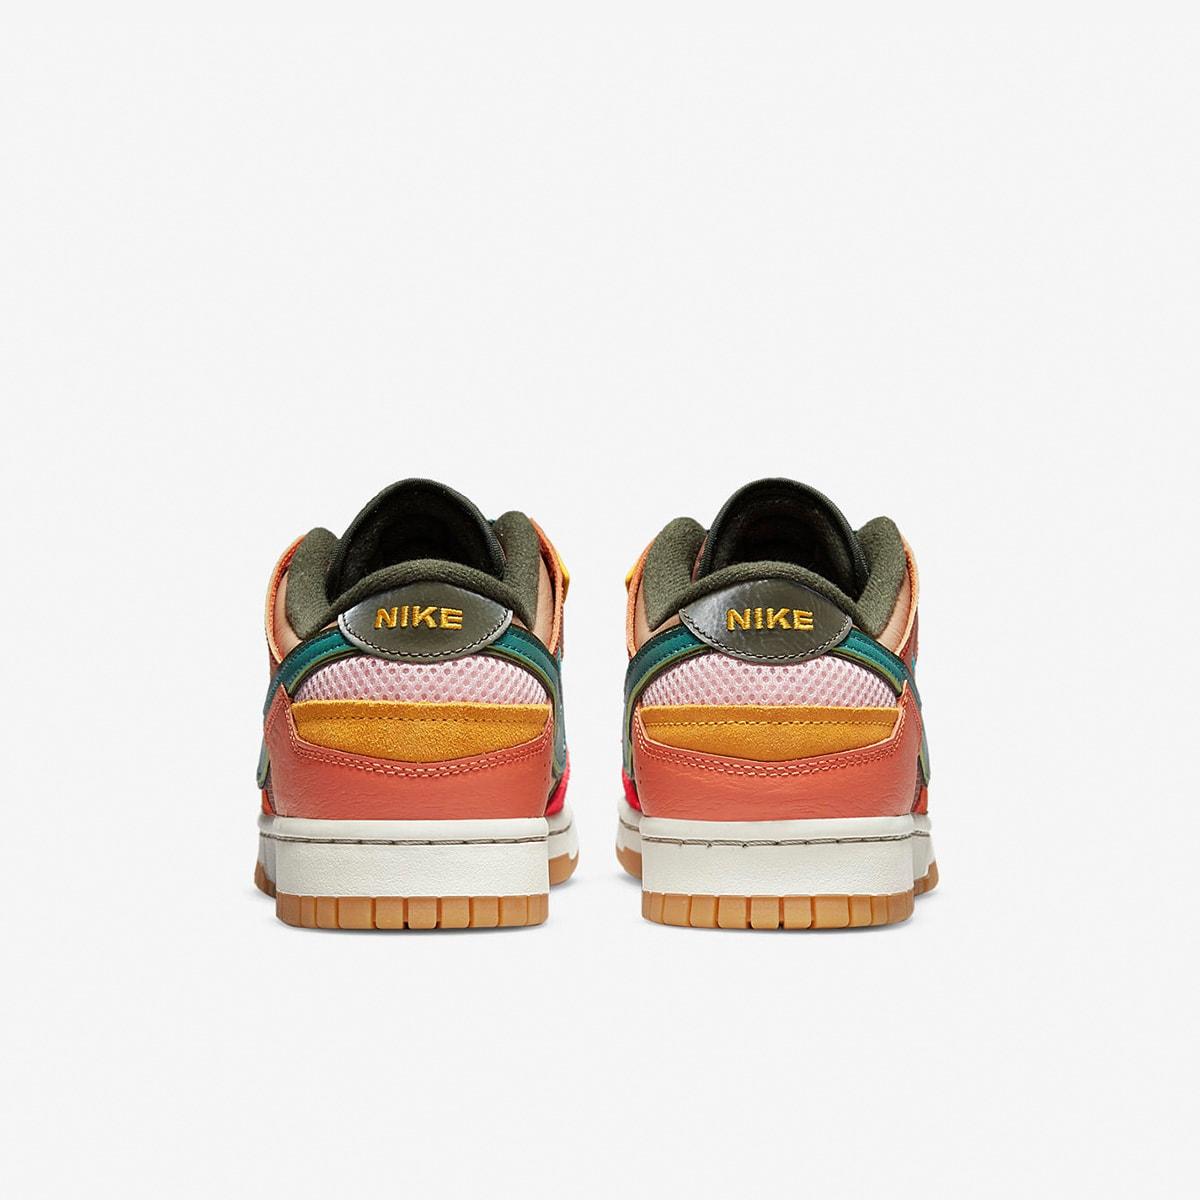 Nike Dunk Scrap - DB0500-200